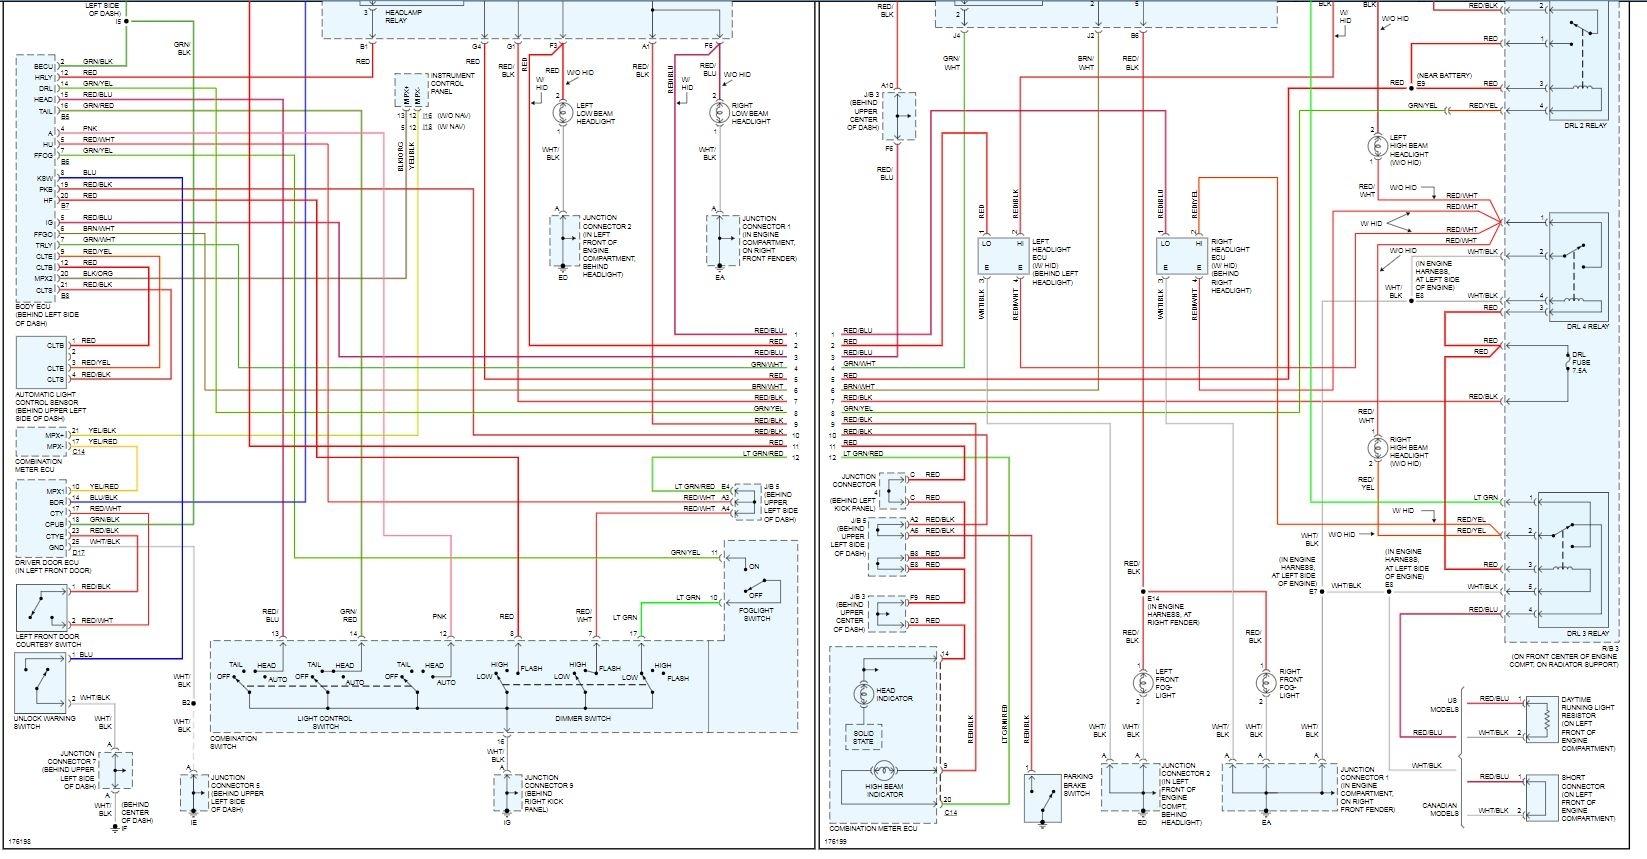 lexus is300 headlight wiring diagram my lexus rx 300 2003 high beam headlights are not working high  lexus rx 300 2003 high beam headlights